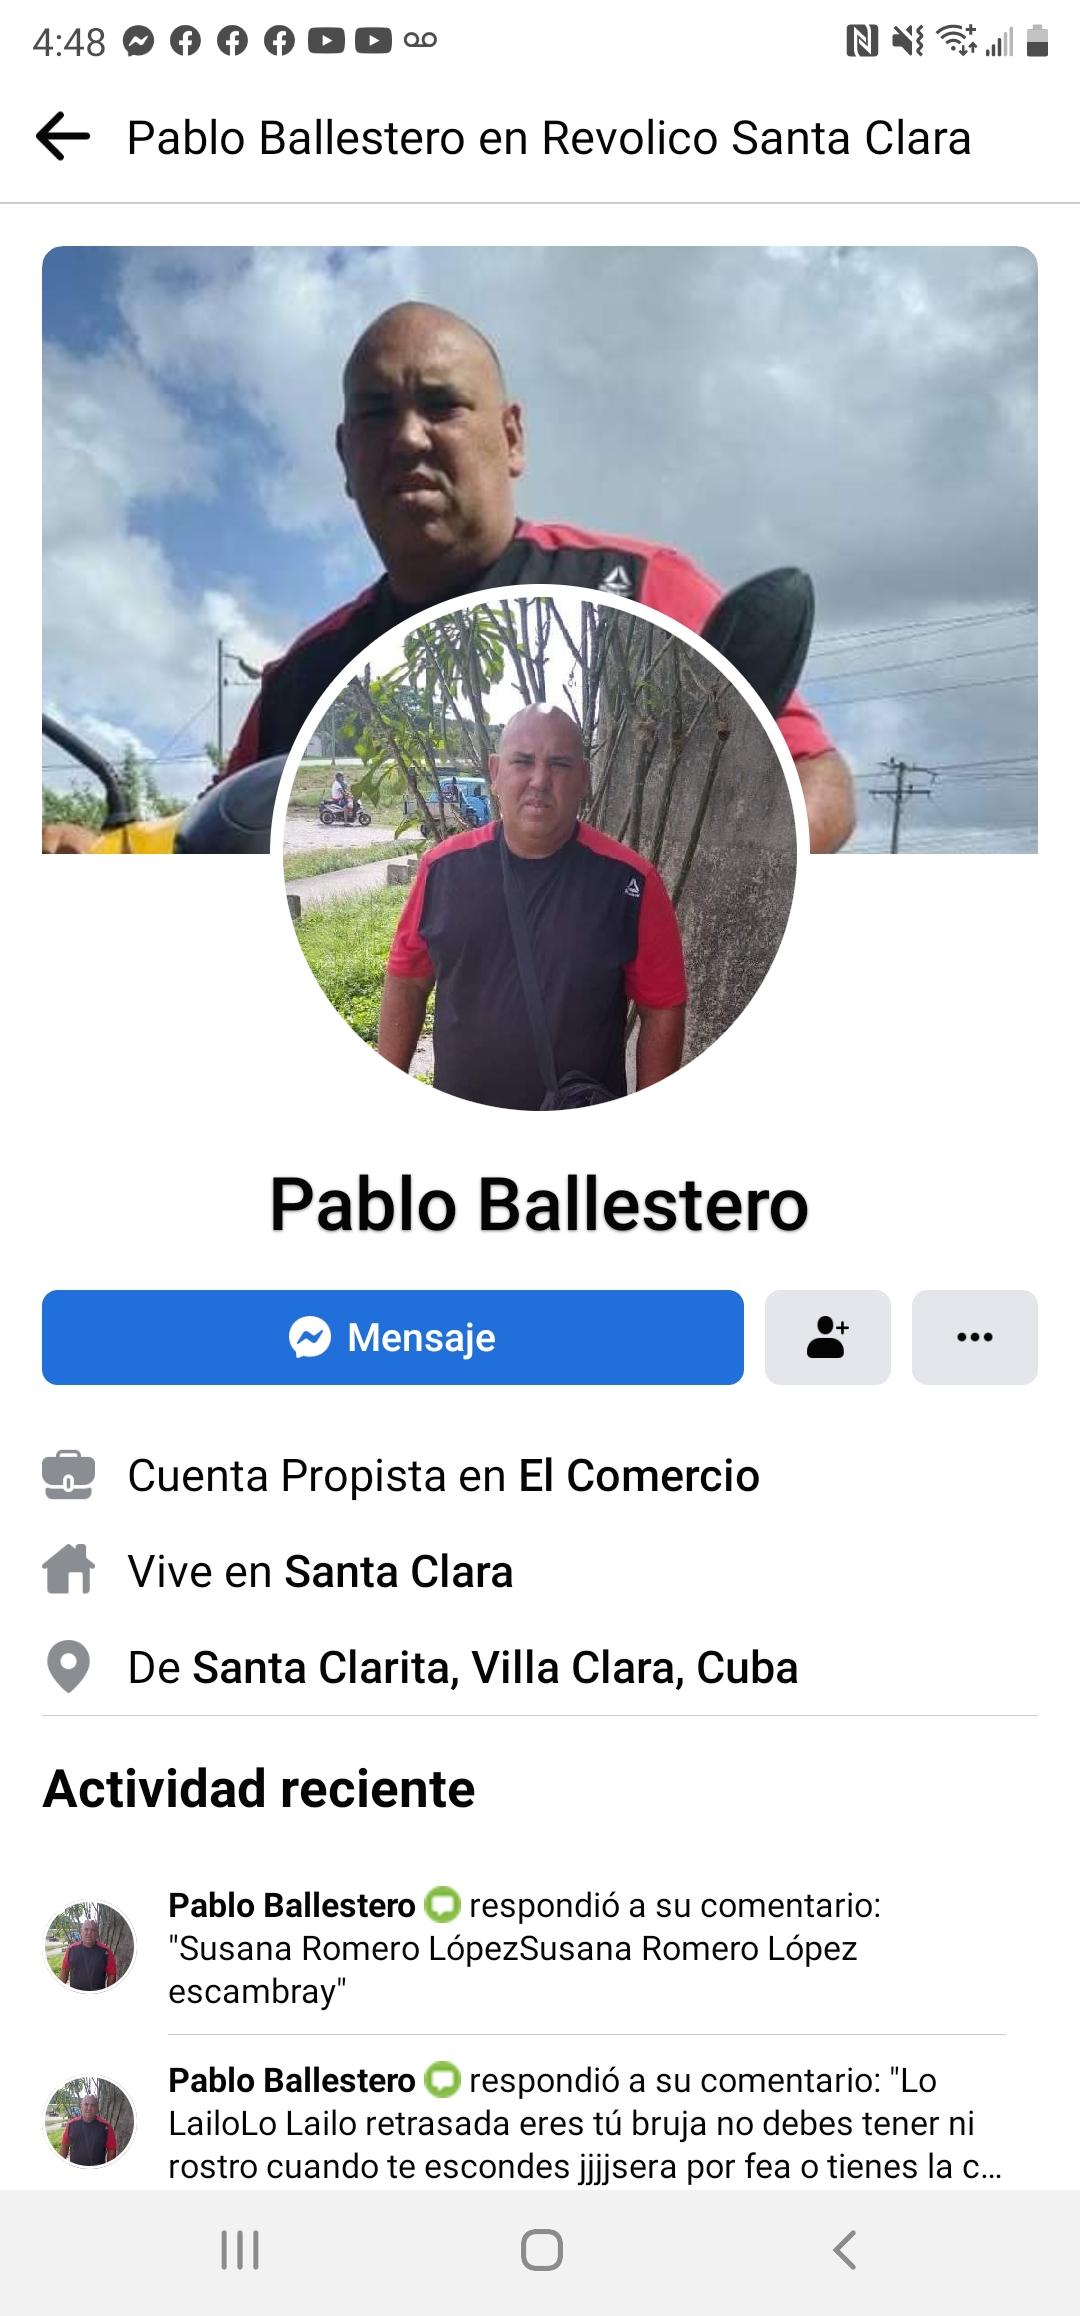 Pablo Ballestero